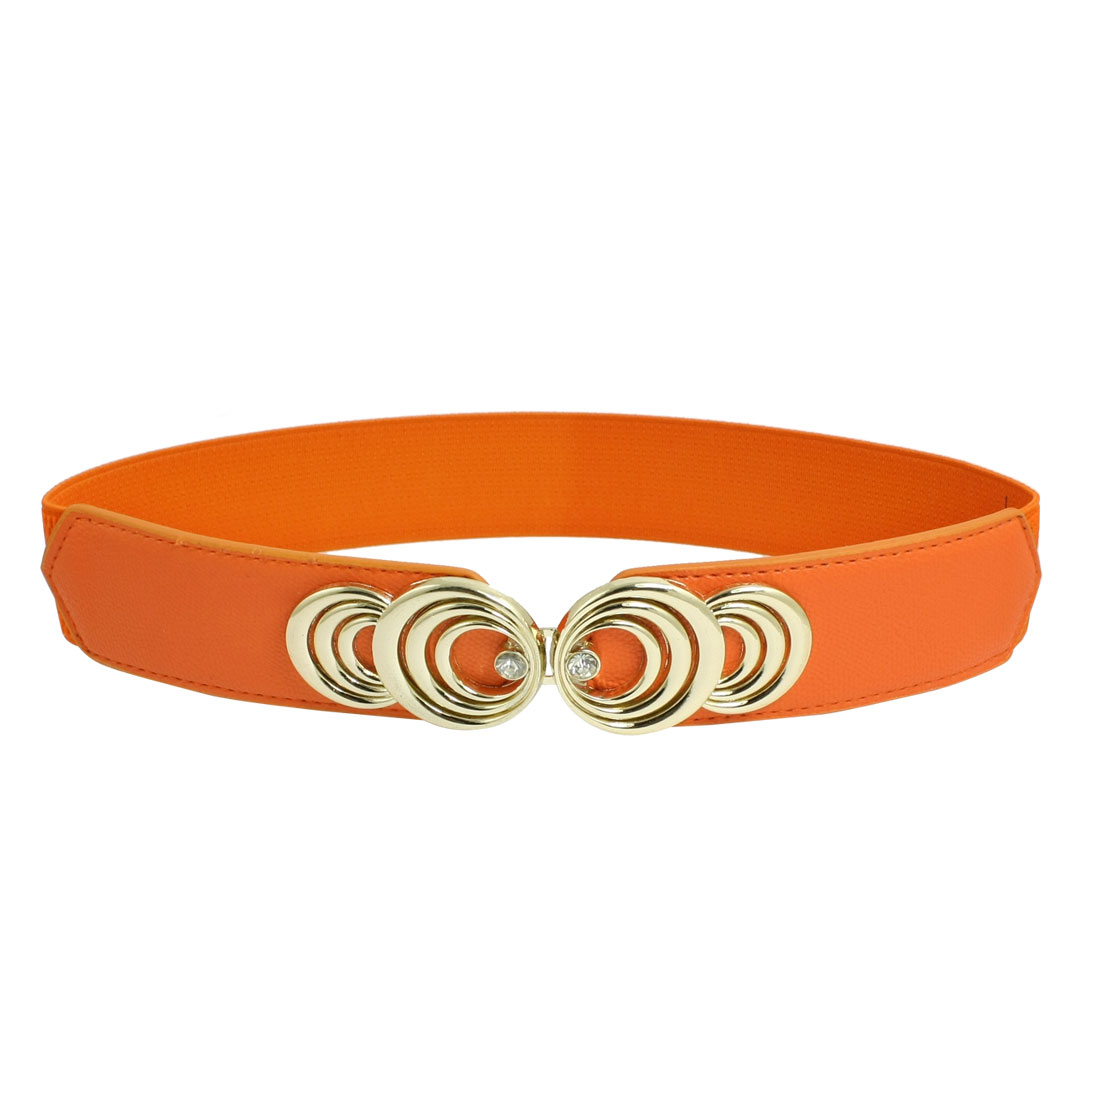 Women 3.8cm Wide Metal Interlock Buckle Stretch Cinch Waist Belt Orange